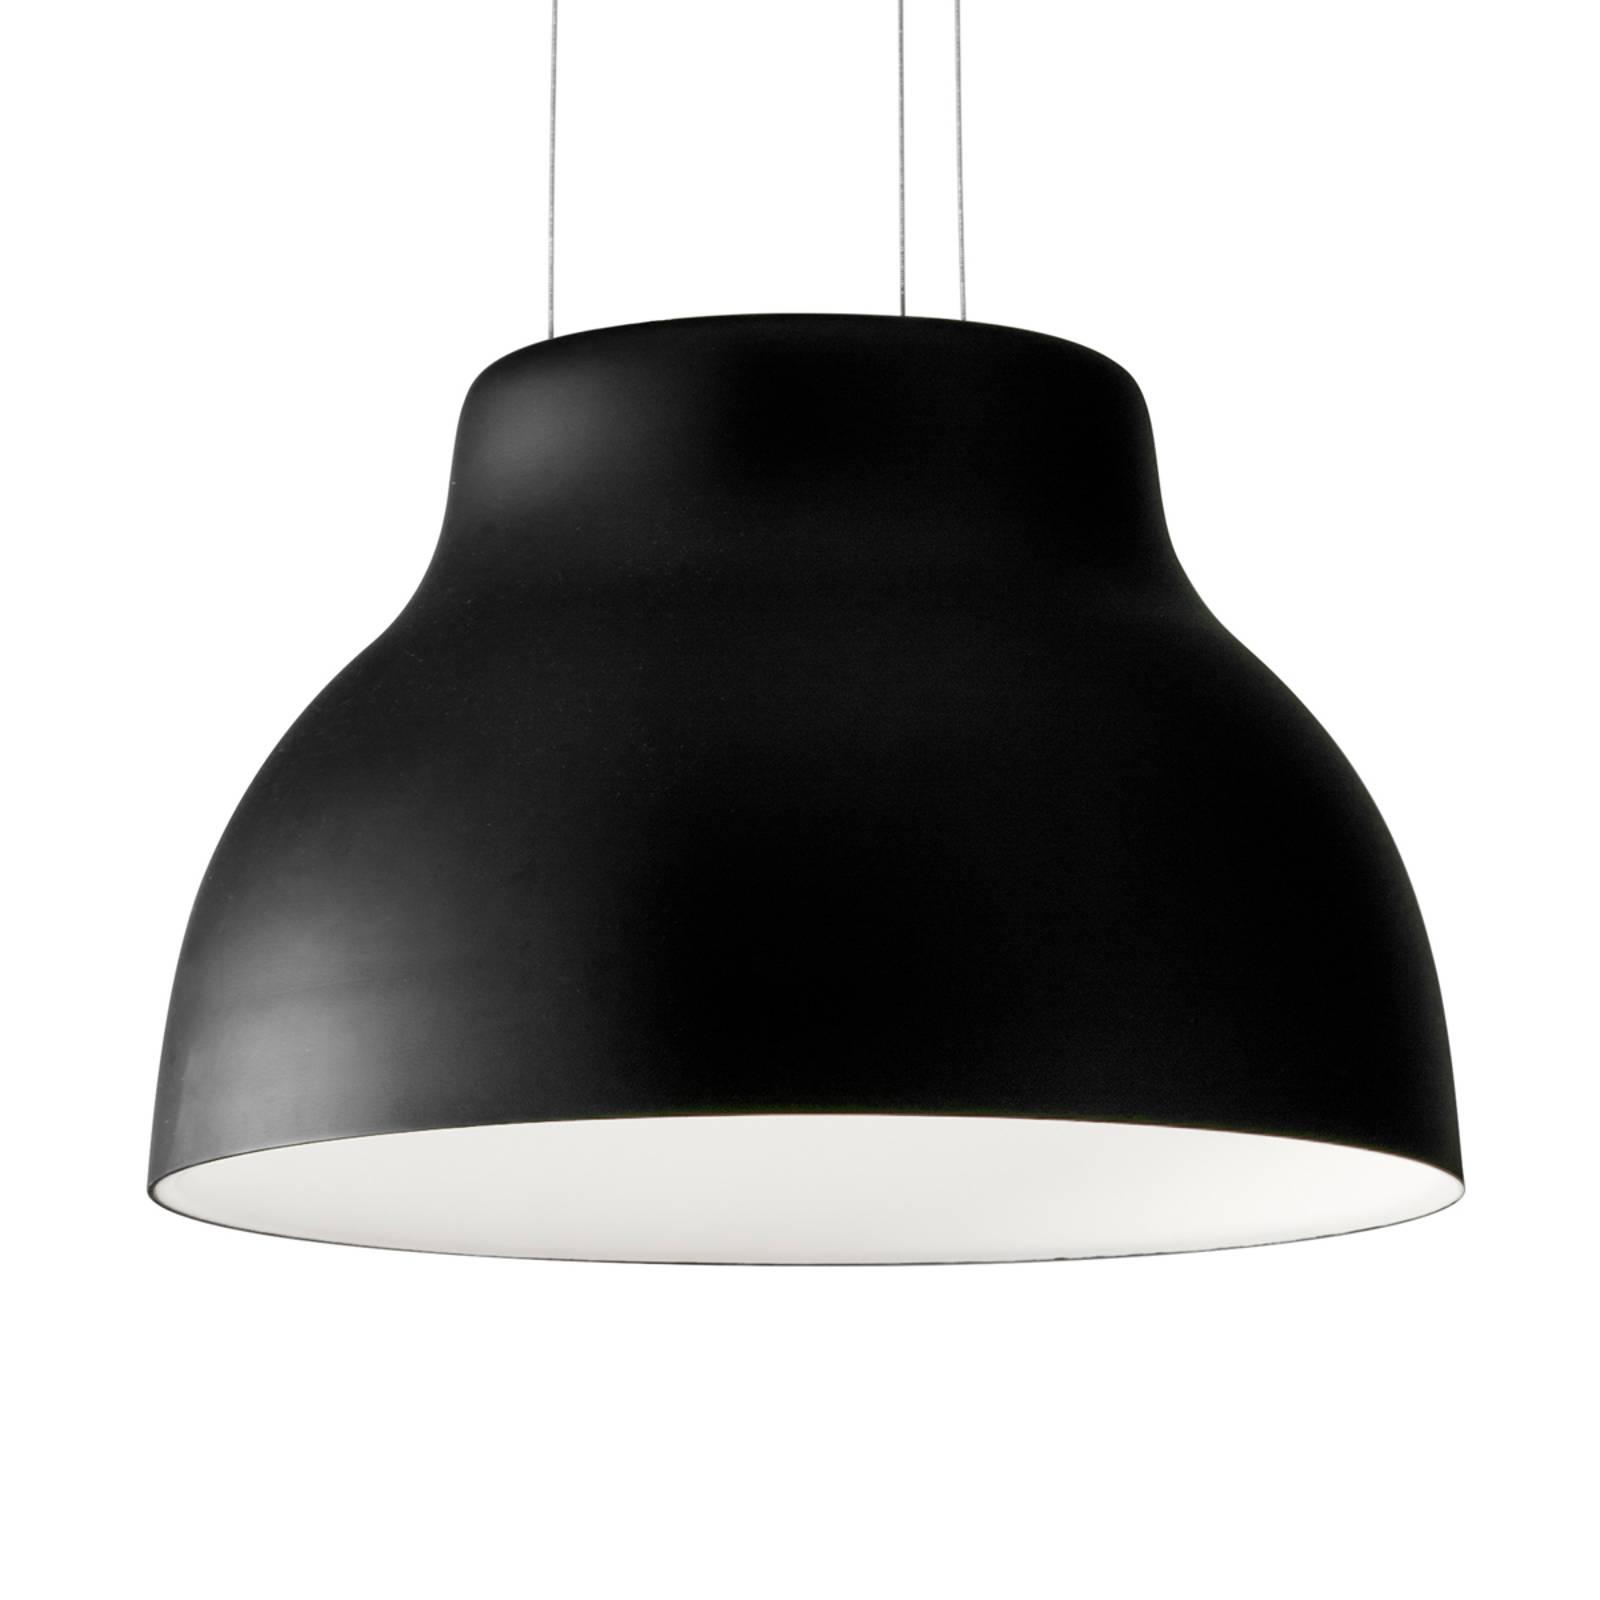 Martinelli Luce Cicala -LED-riippuvalaisin musta